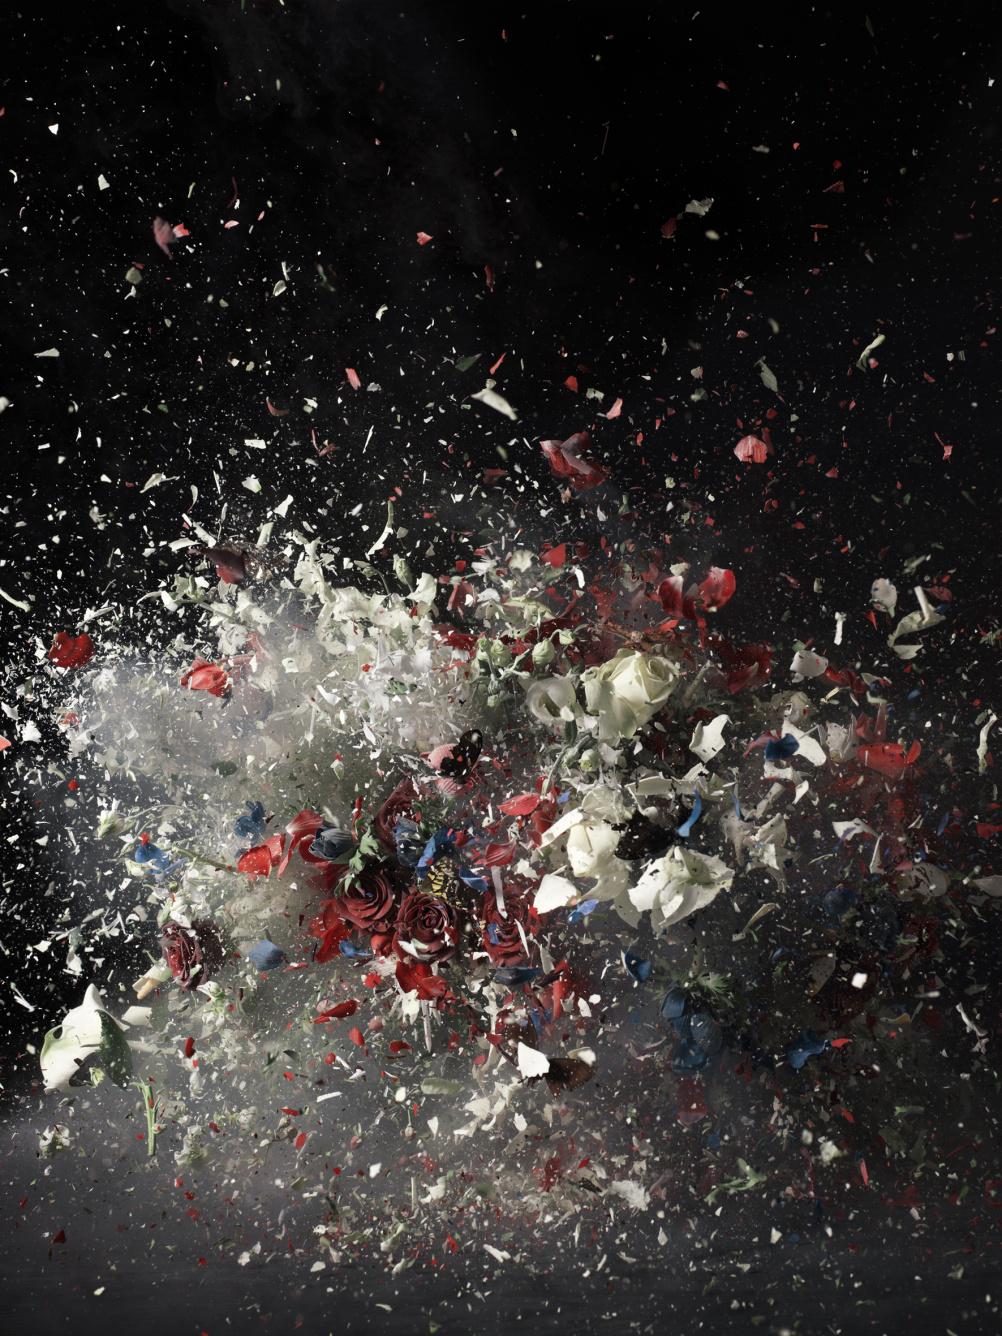 Blow Up, Untitled 1, 2007, Ori Gersht © Ori Gersht, Private Collection